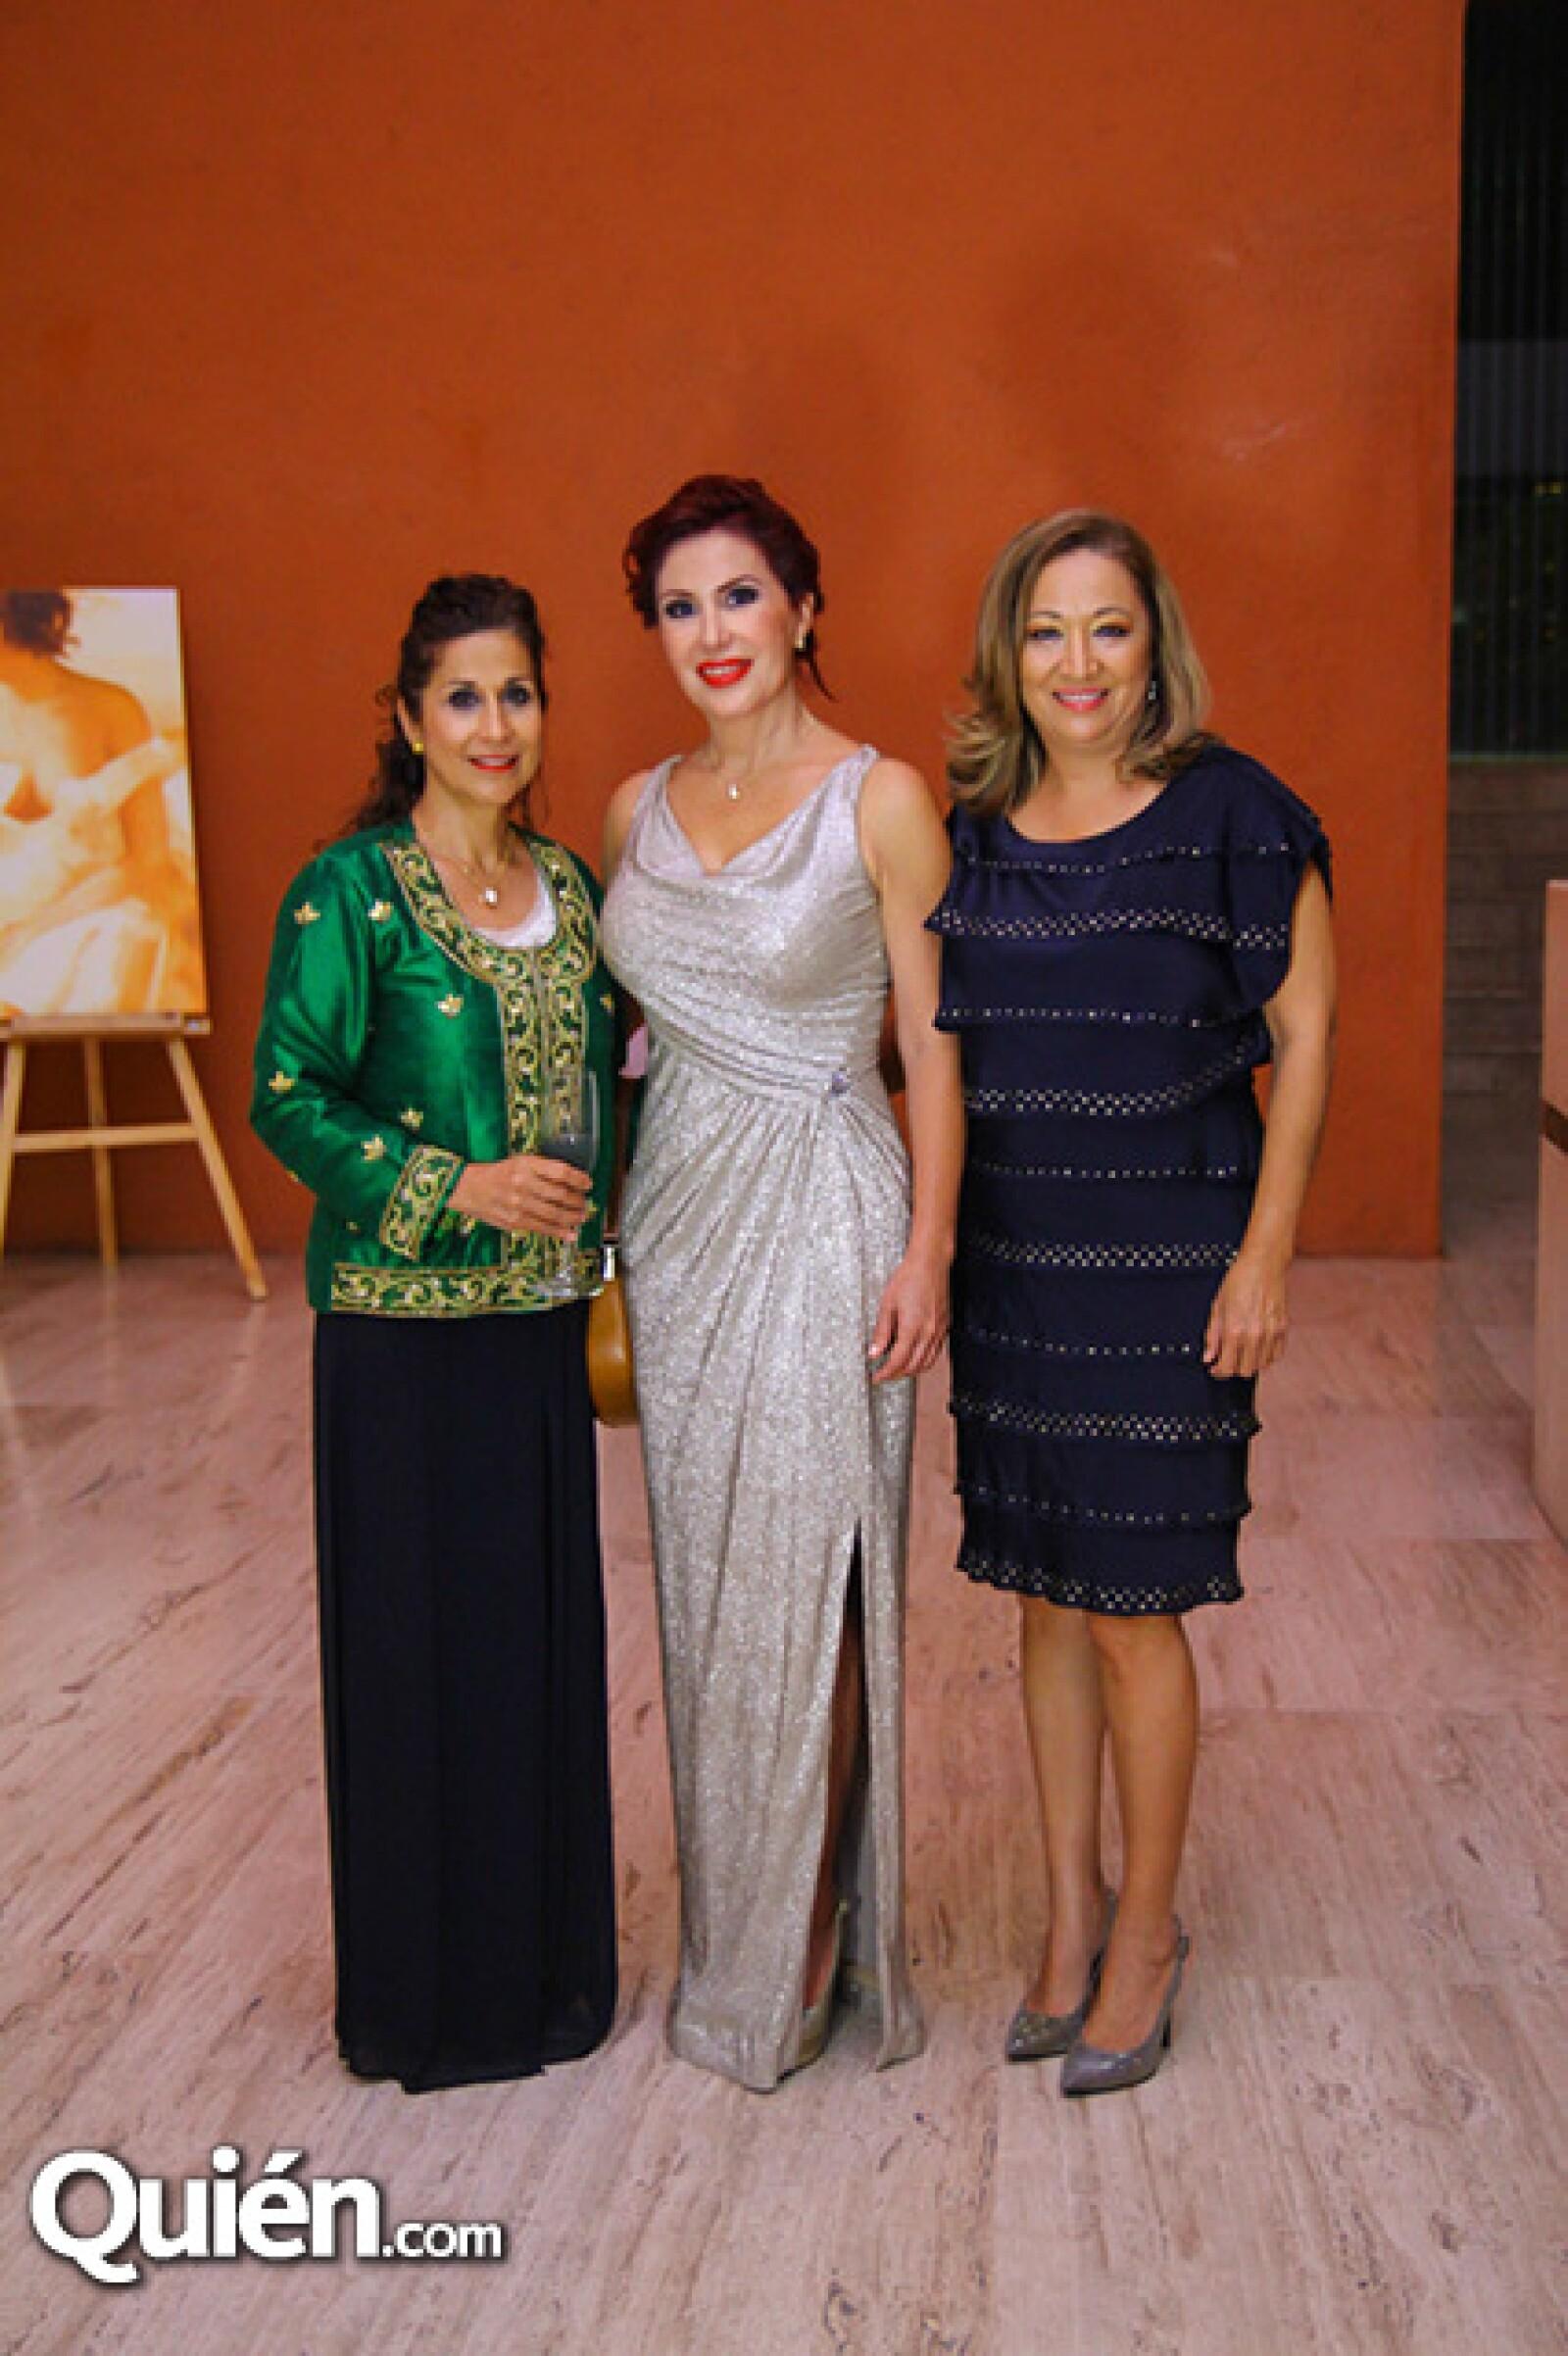 Liliana García,Elsa Martínez y Angeles Wong